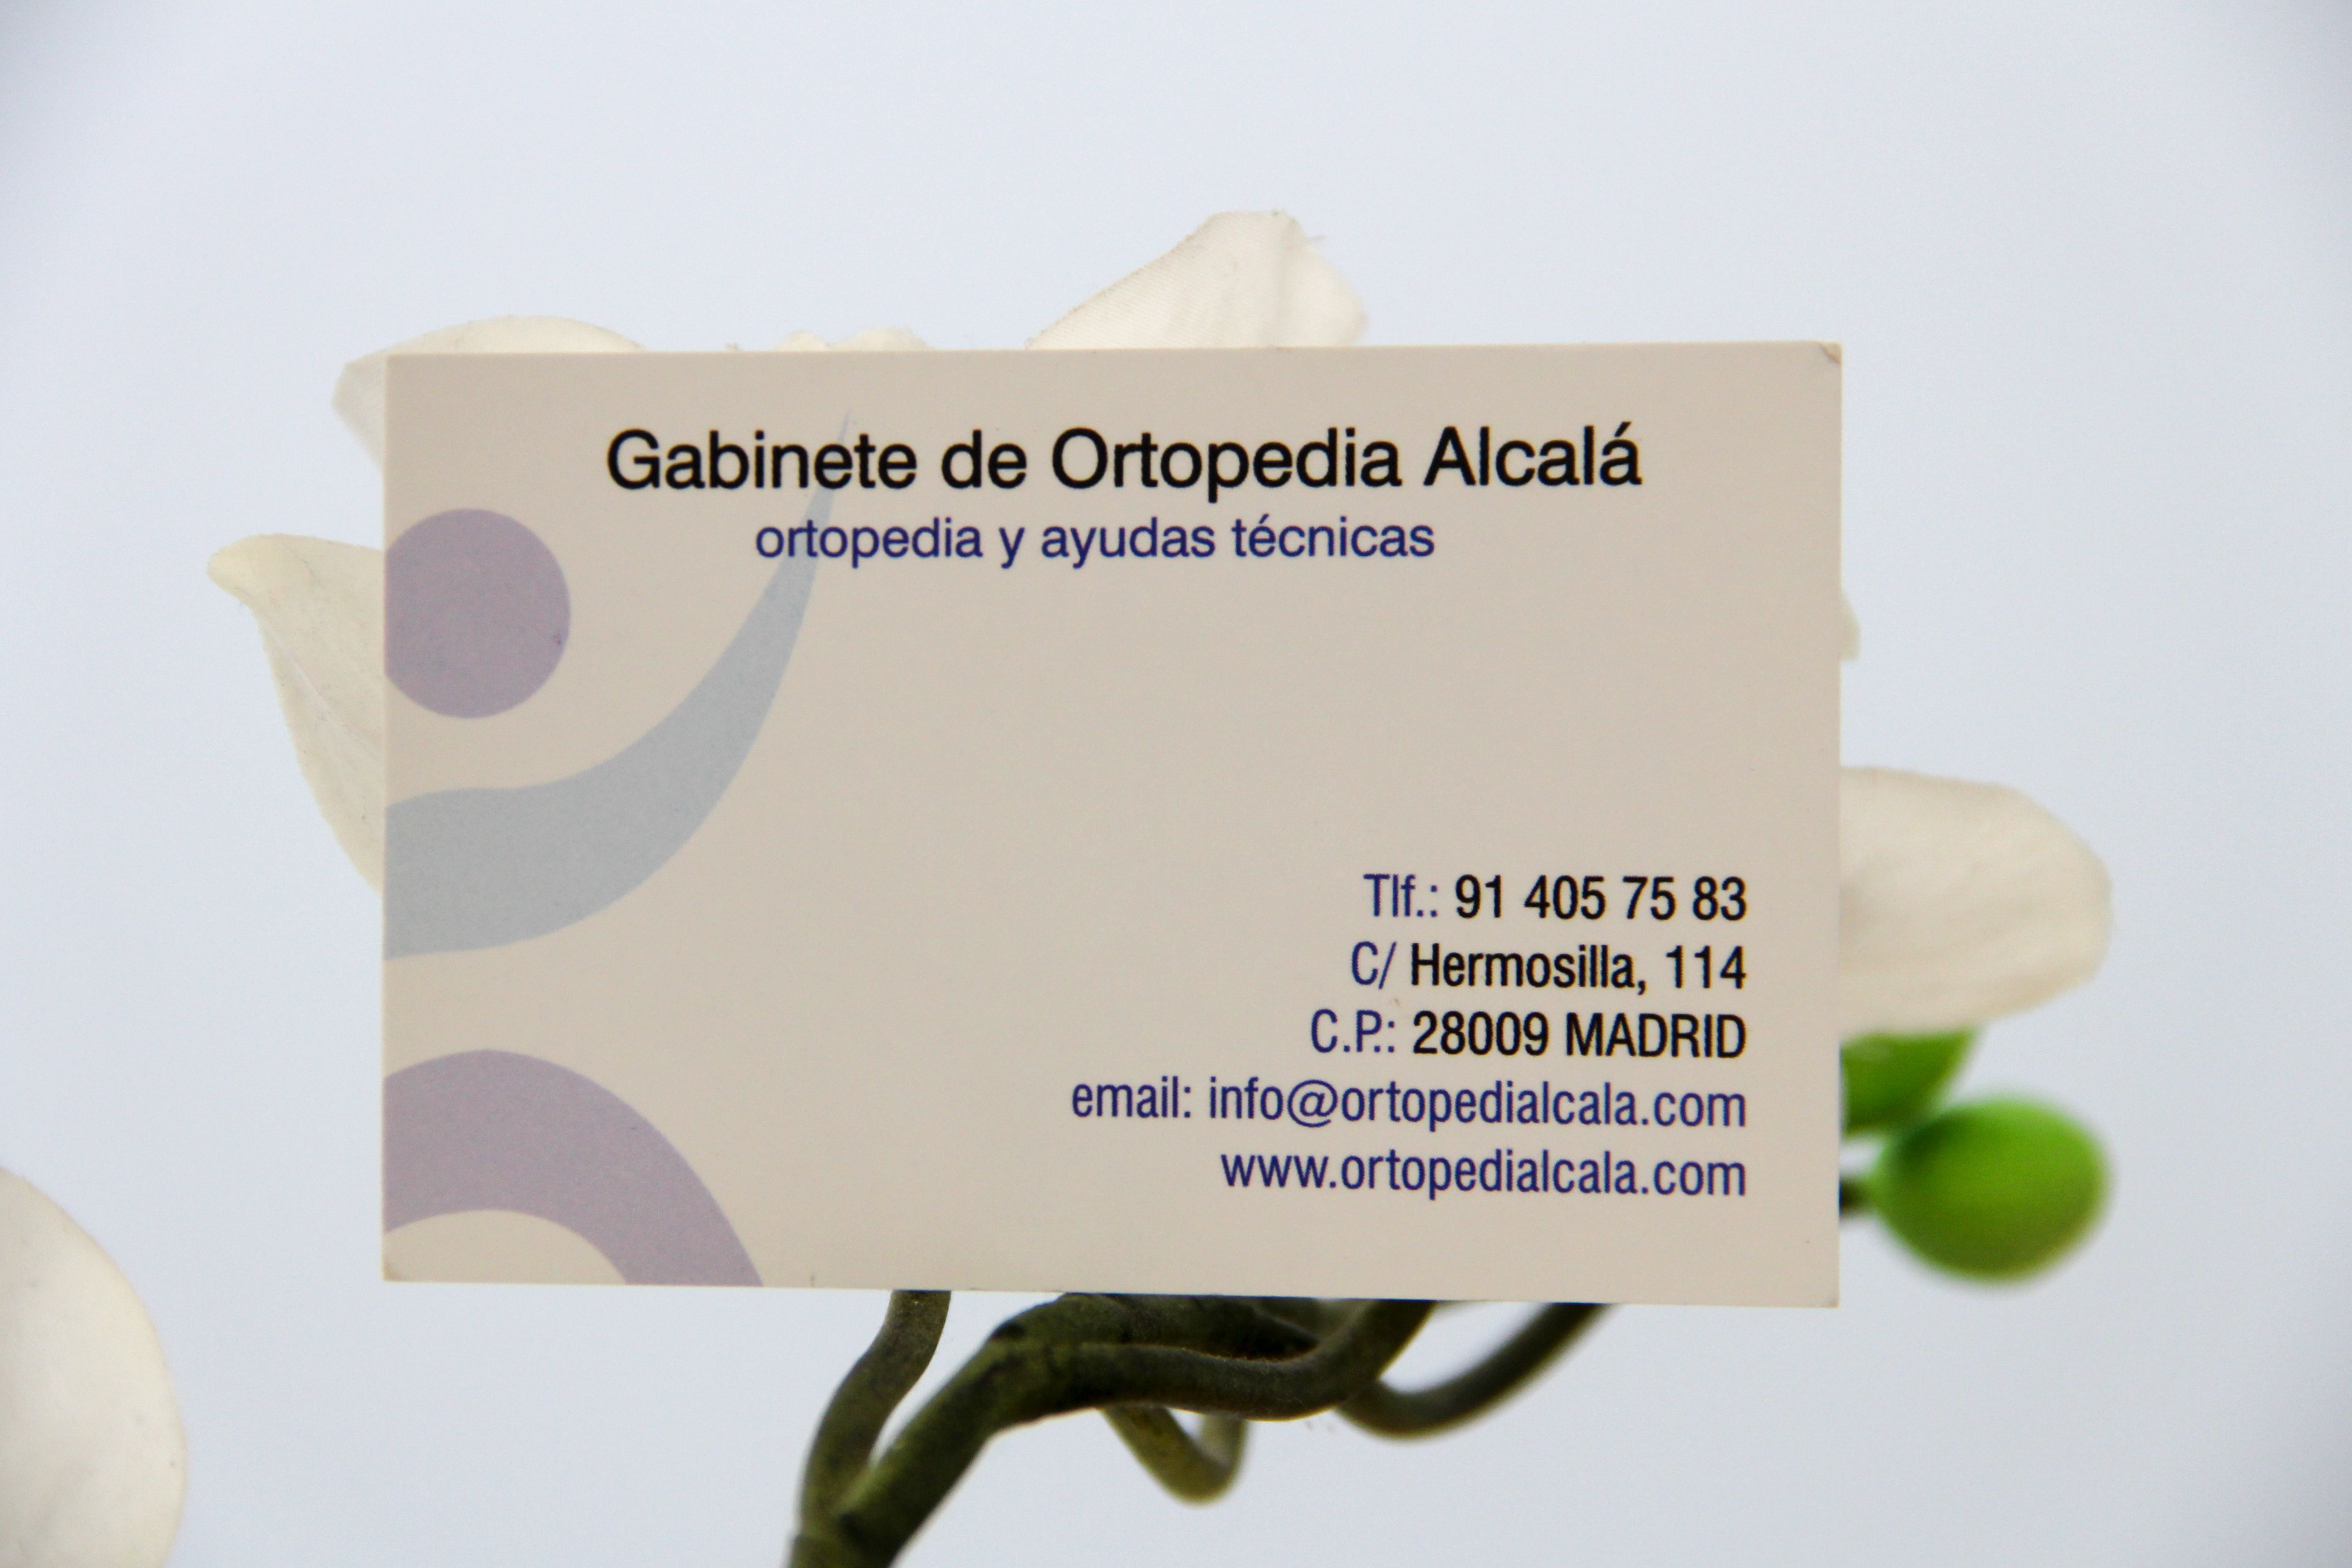 Foto 6 de Ortopedia en Madrid | Gabinete de Ortopedia Alcalá, S.L.